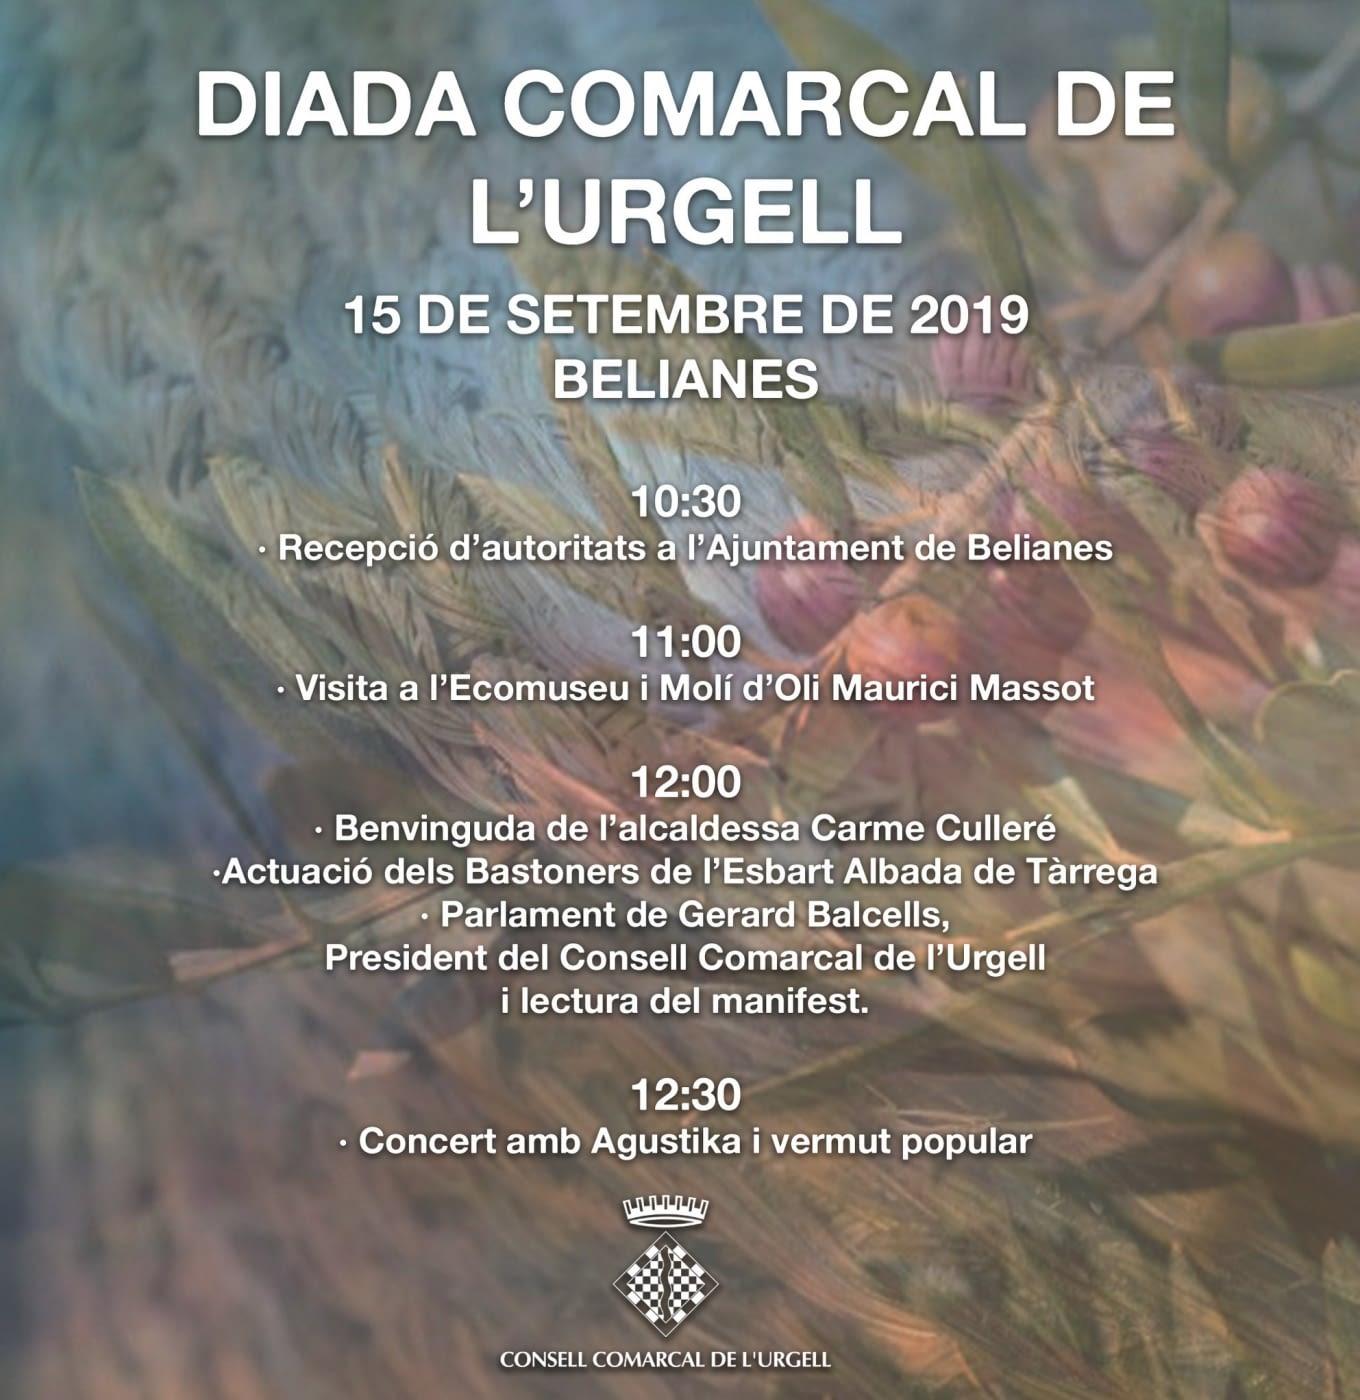 DIADA DE LA COMARCA – 15 DE SETEMBRE